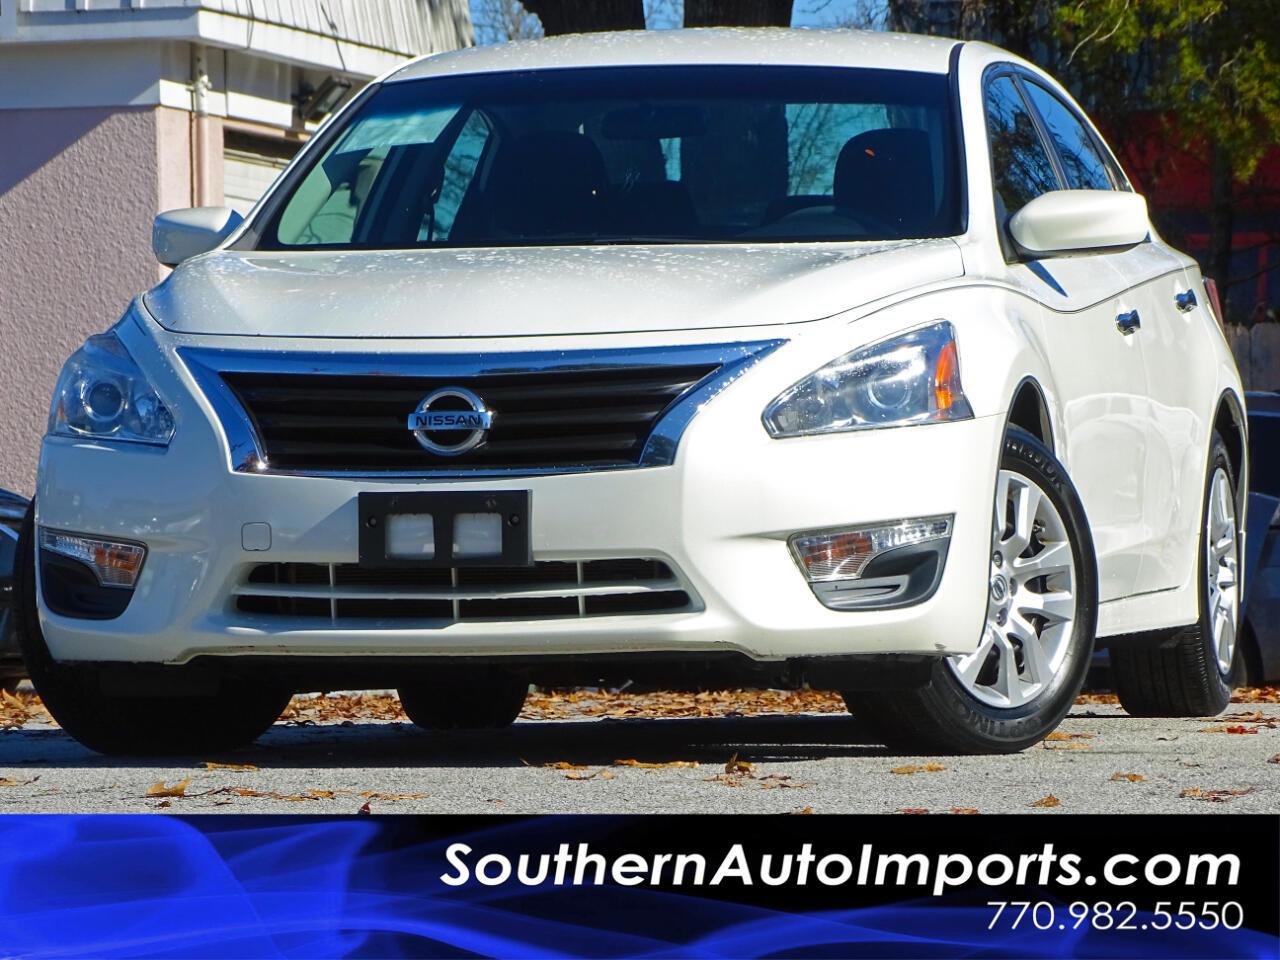 2014 Nissan Altima 4dr Sdn I4 2.5 S